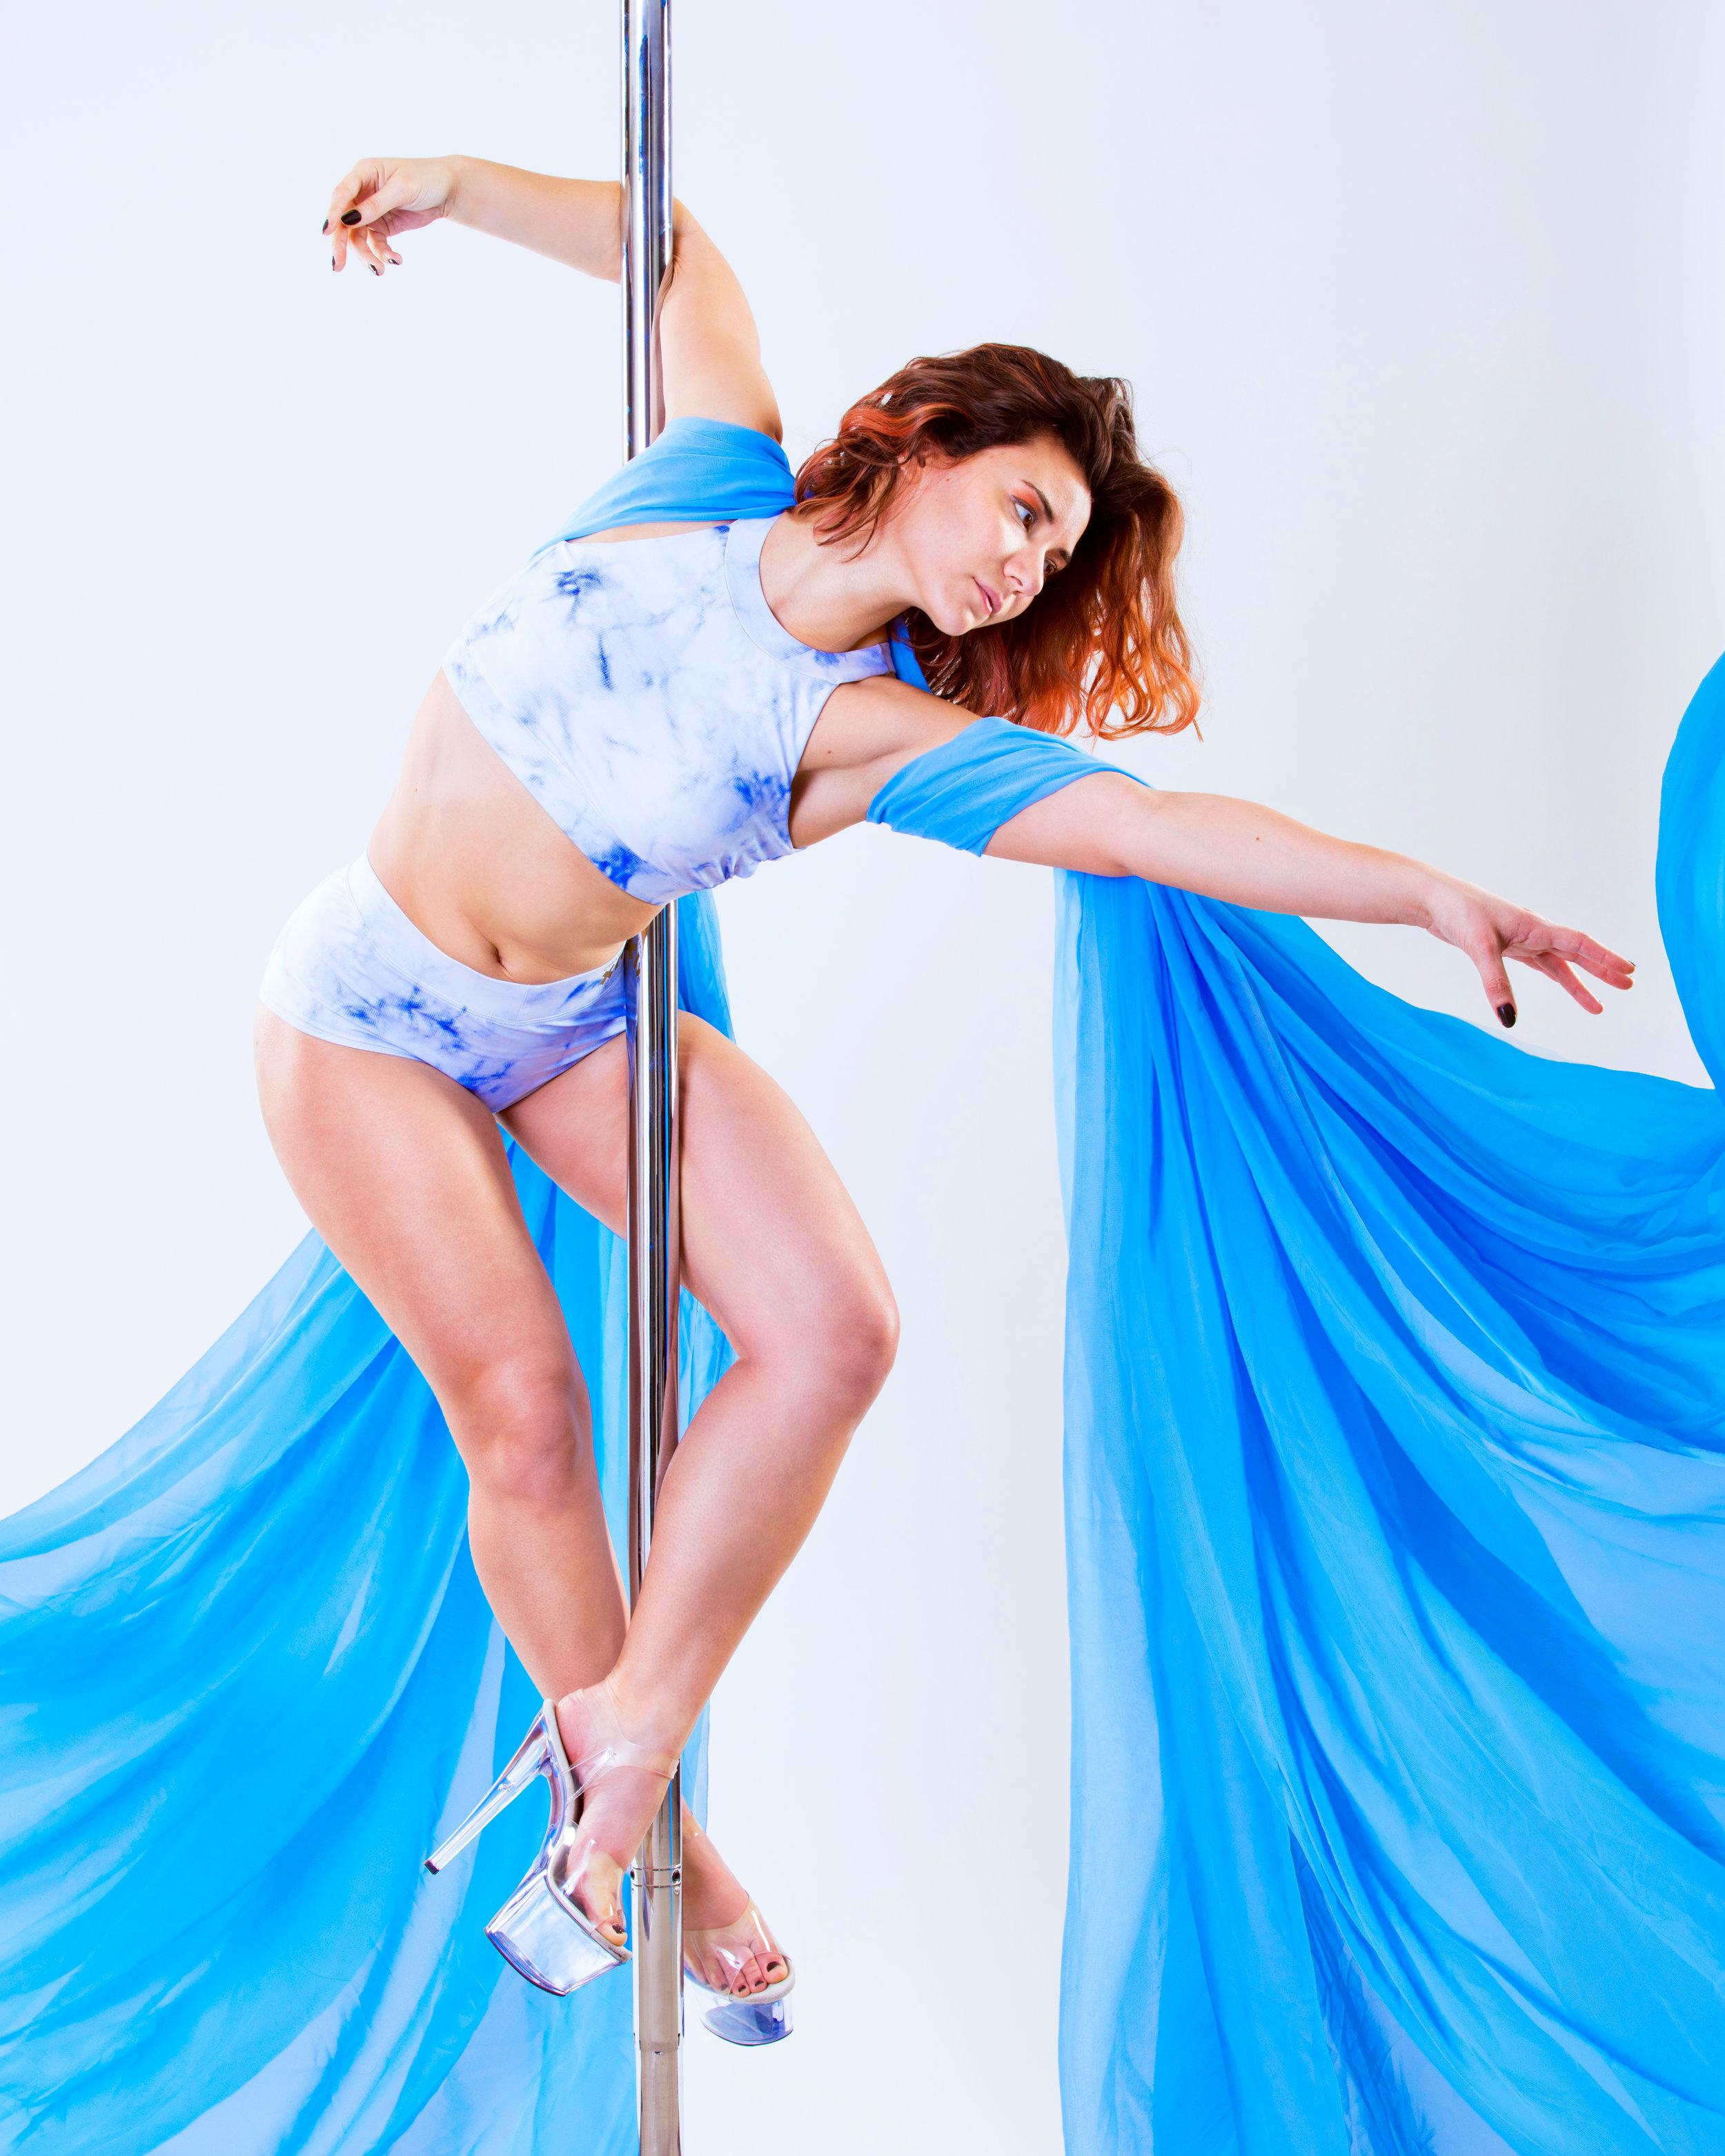 DancePortfolio03042019-4_C-FINALweb.jpg